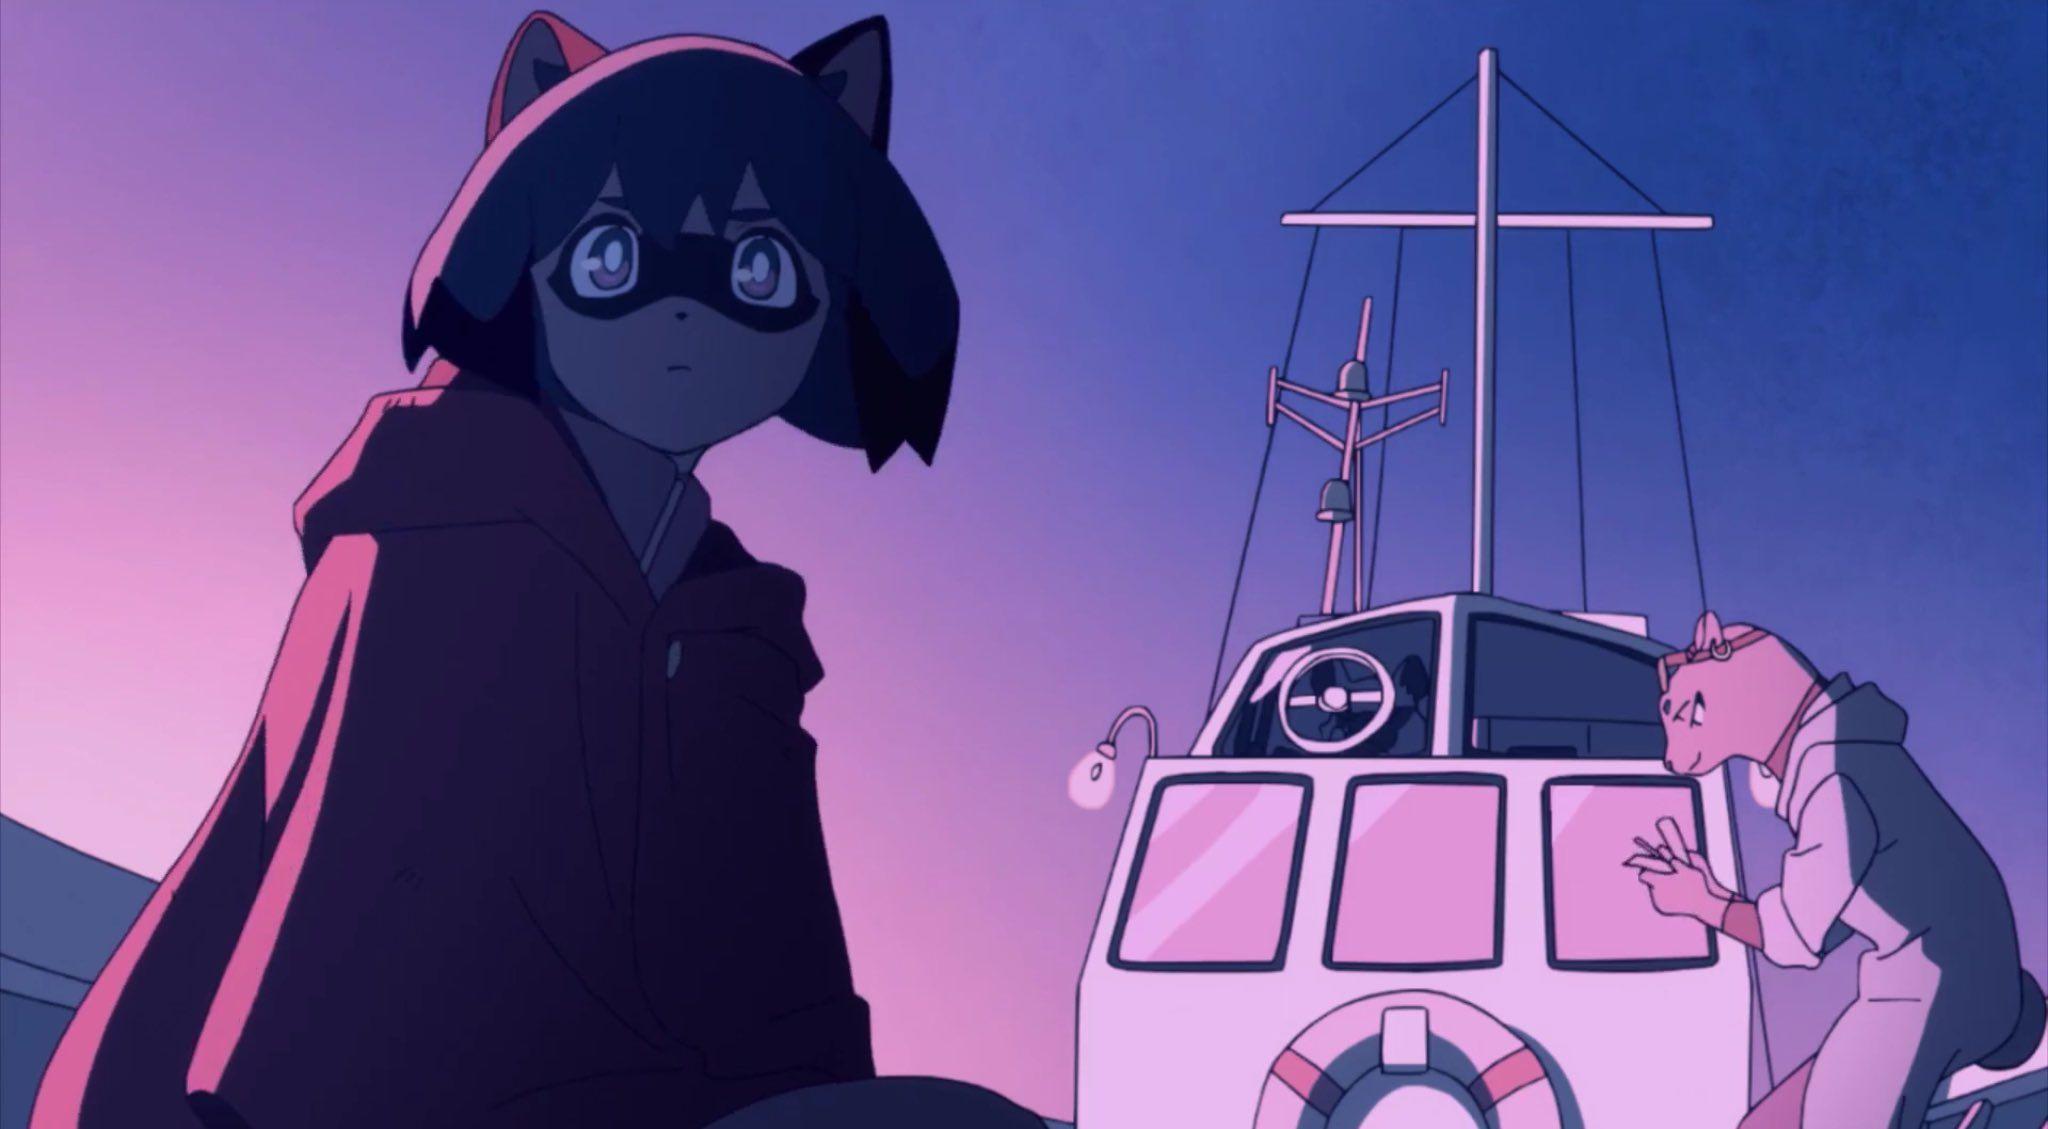 pin by emma londa on bna anime anime shows furry art